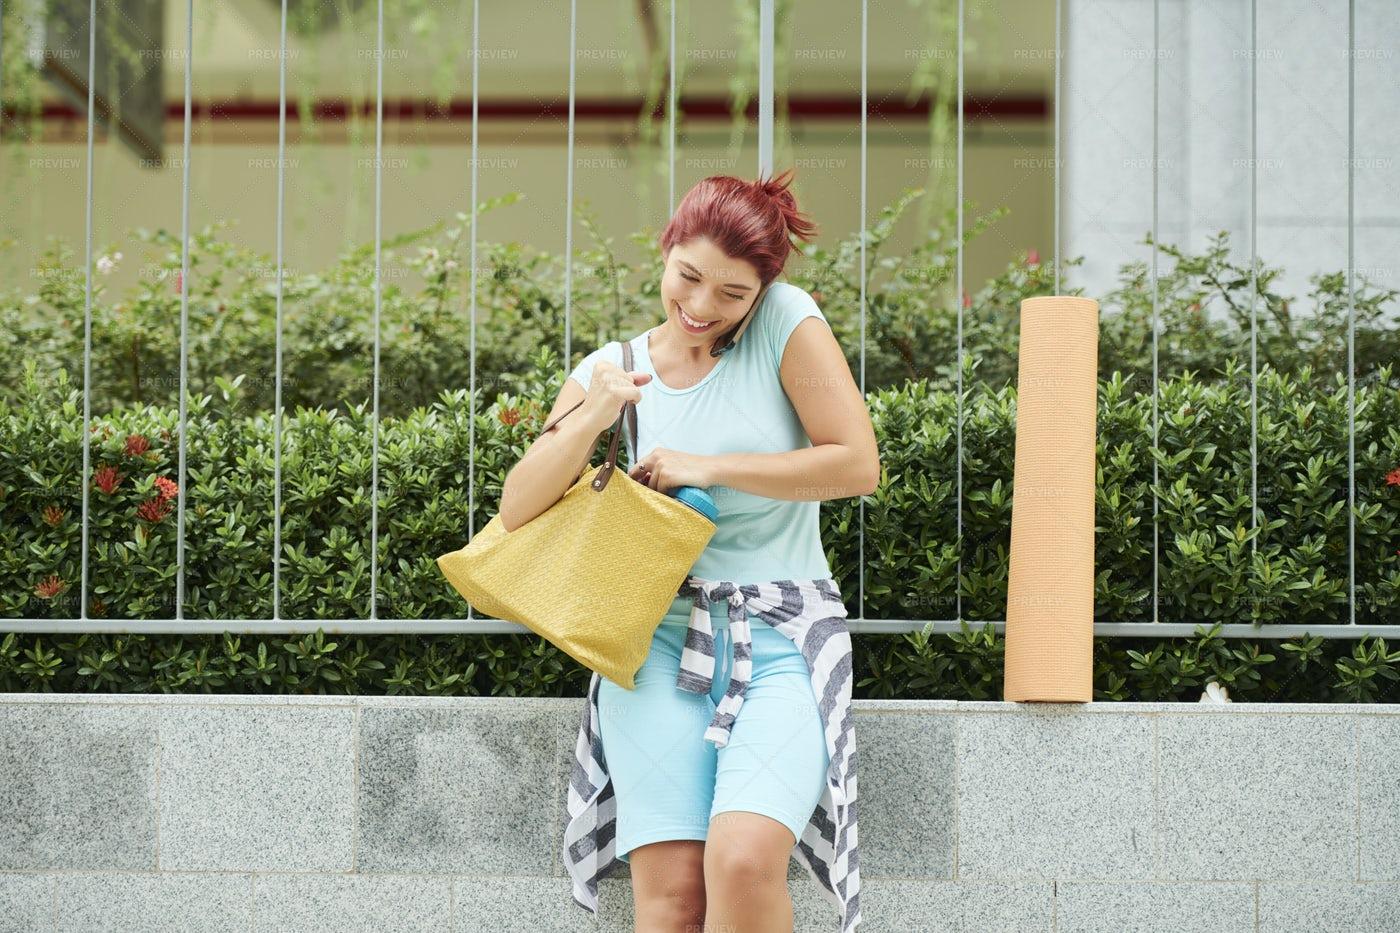 Cheerful Woman Talking On Phone: Stock Photos